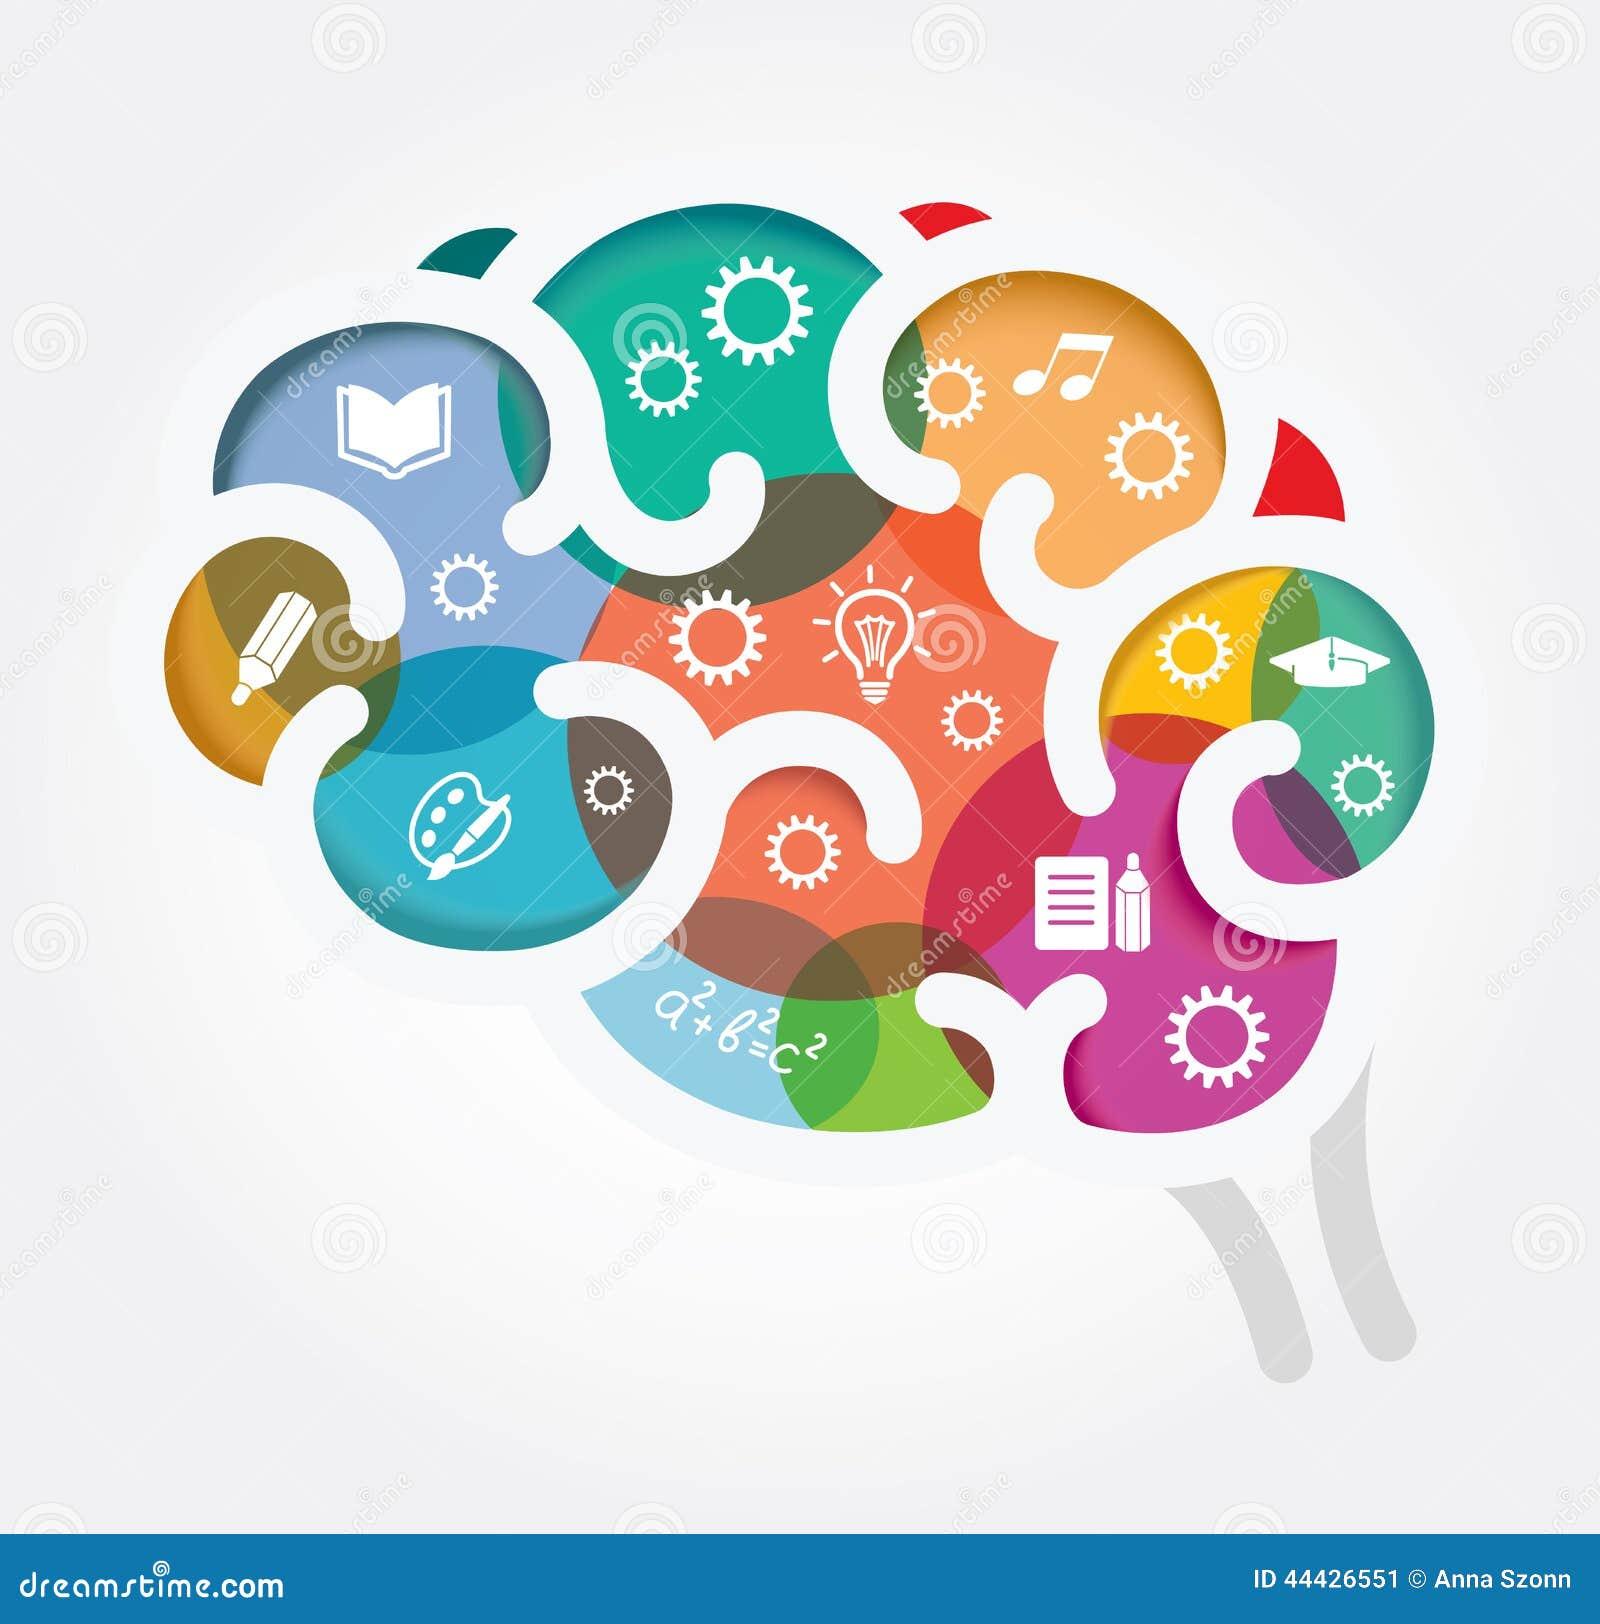 Creative Thinking  Con...